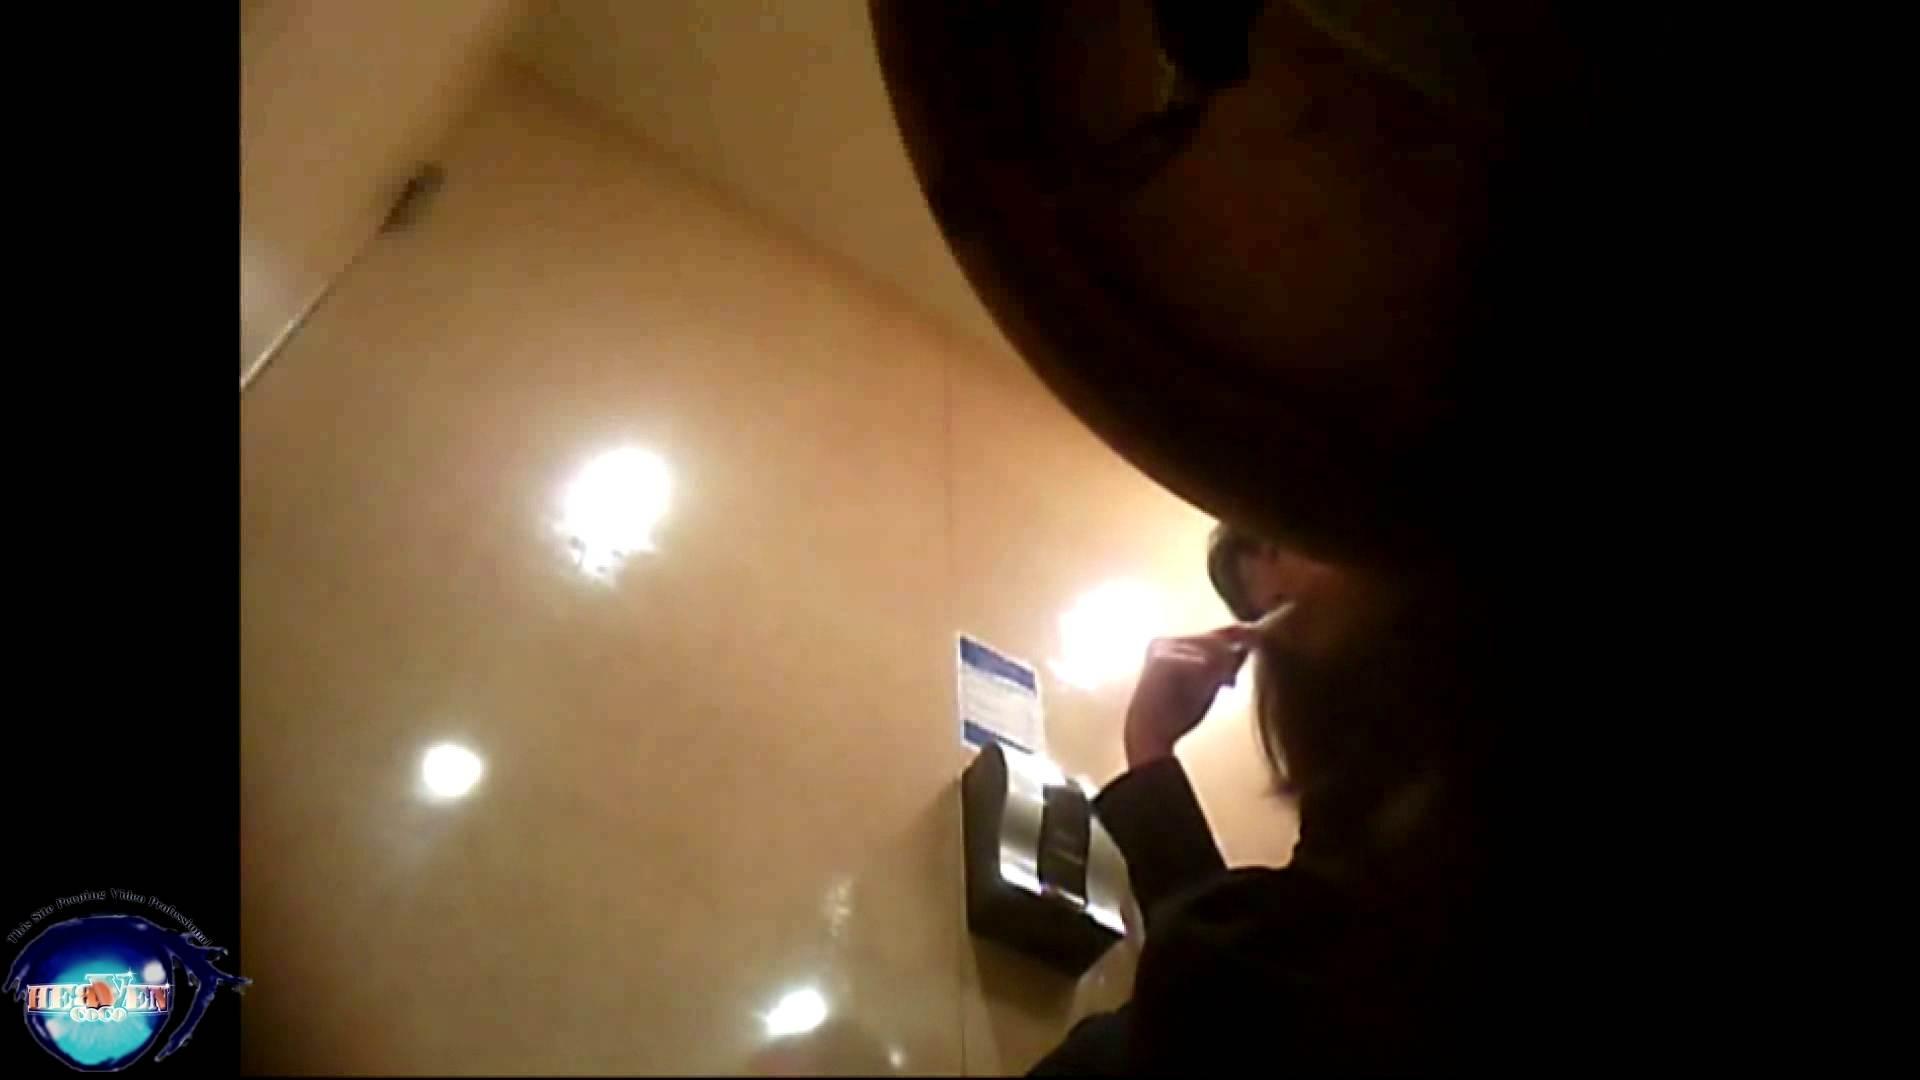 突撃!女子化粧室の真実vol.04 盗撮師作品 オマンコ無修正動画無料 80pic 59